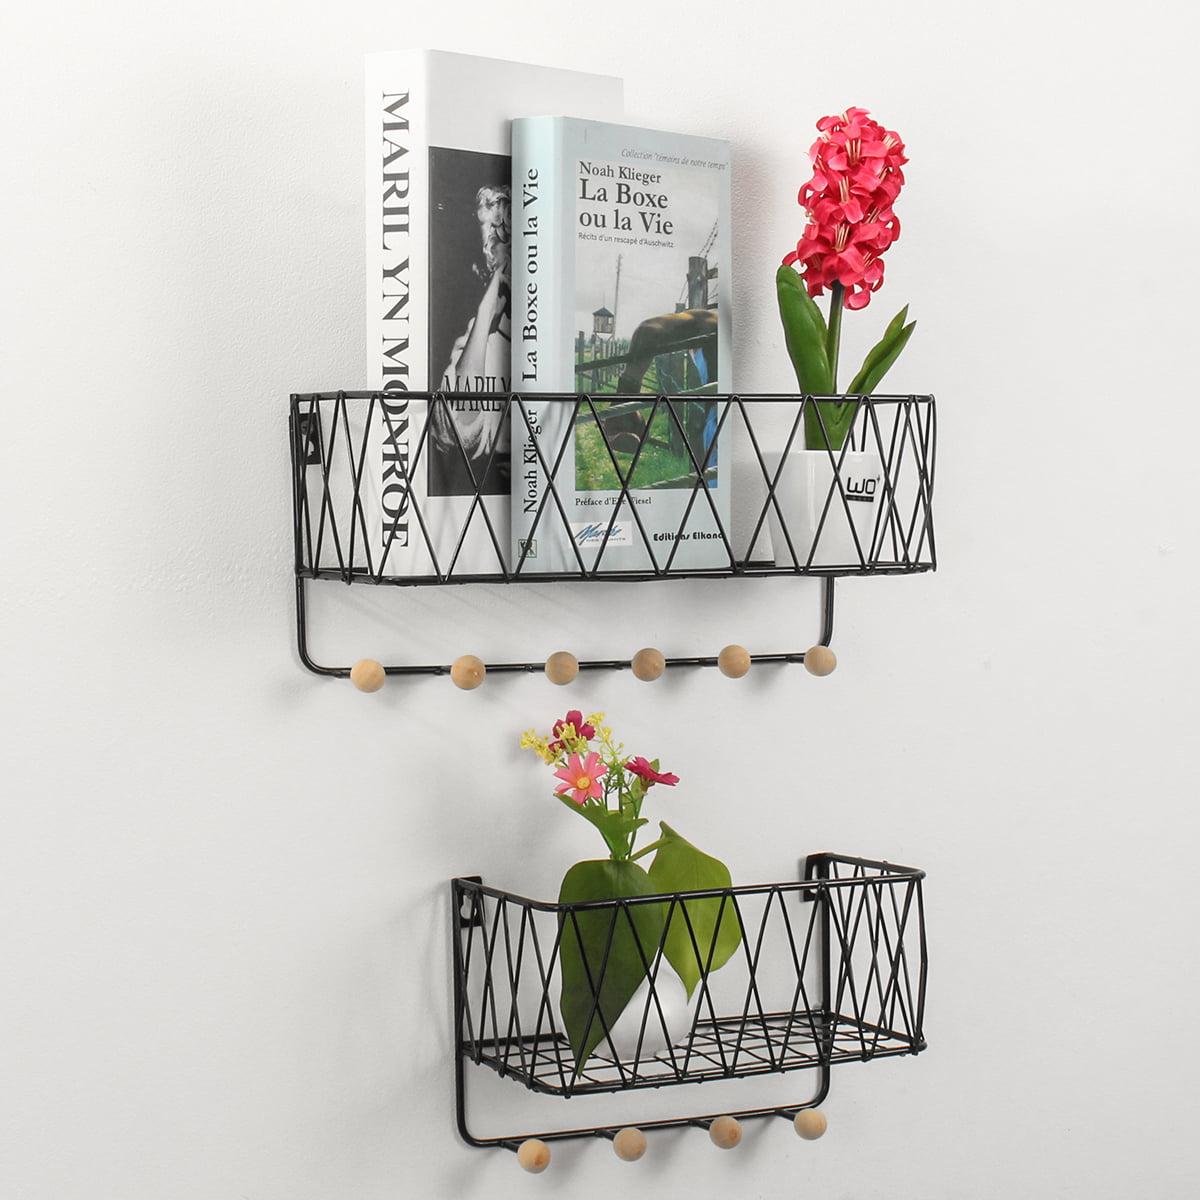 Metal Wall Shelf Wall Mounted Floating Shelves Decorative Storage Holder Organizer Iron Rack Bracket With Hooks For Bedroom Living Room Bathroom Kitchen Office 14 5x6 5x5 Inch Walmart Com Walmart Com